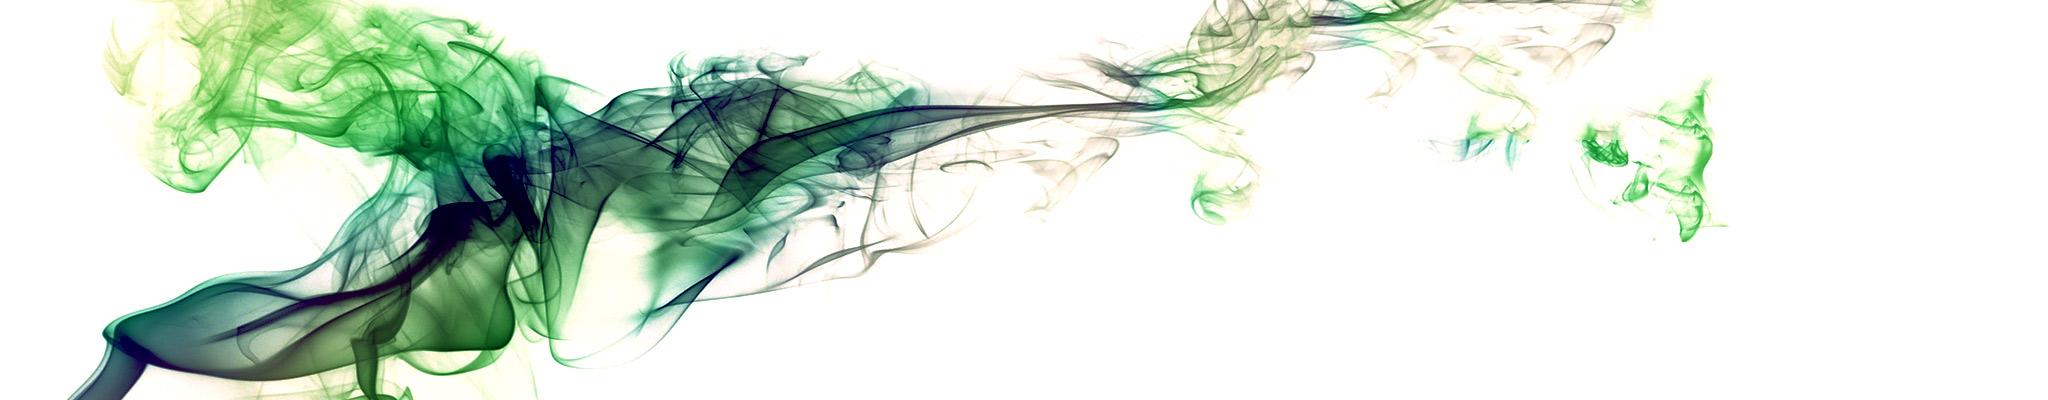 silenziatori impianti fumari genova